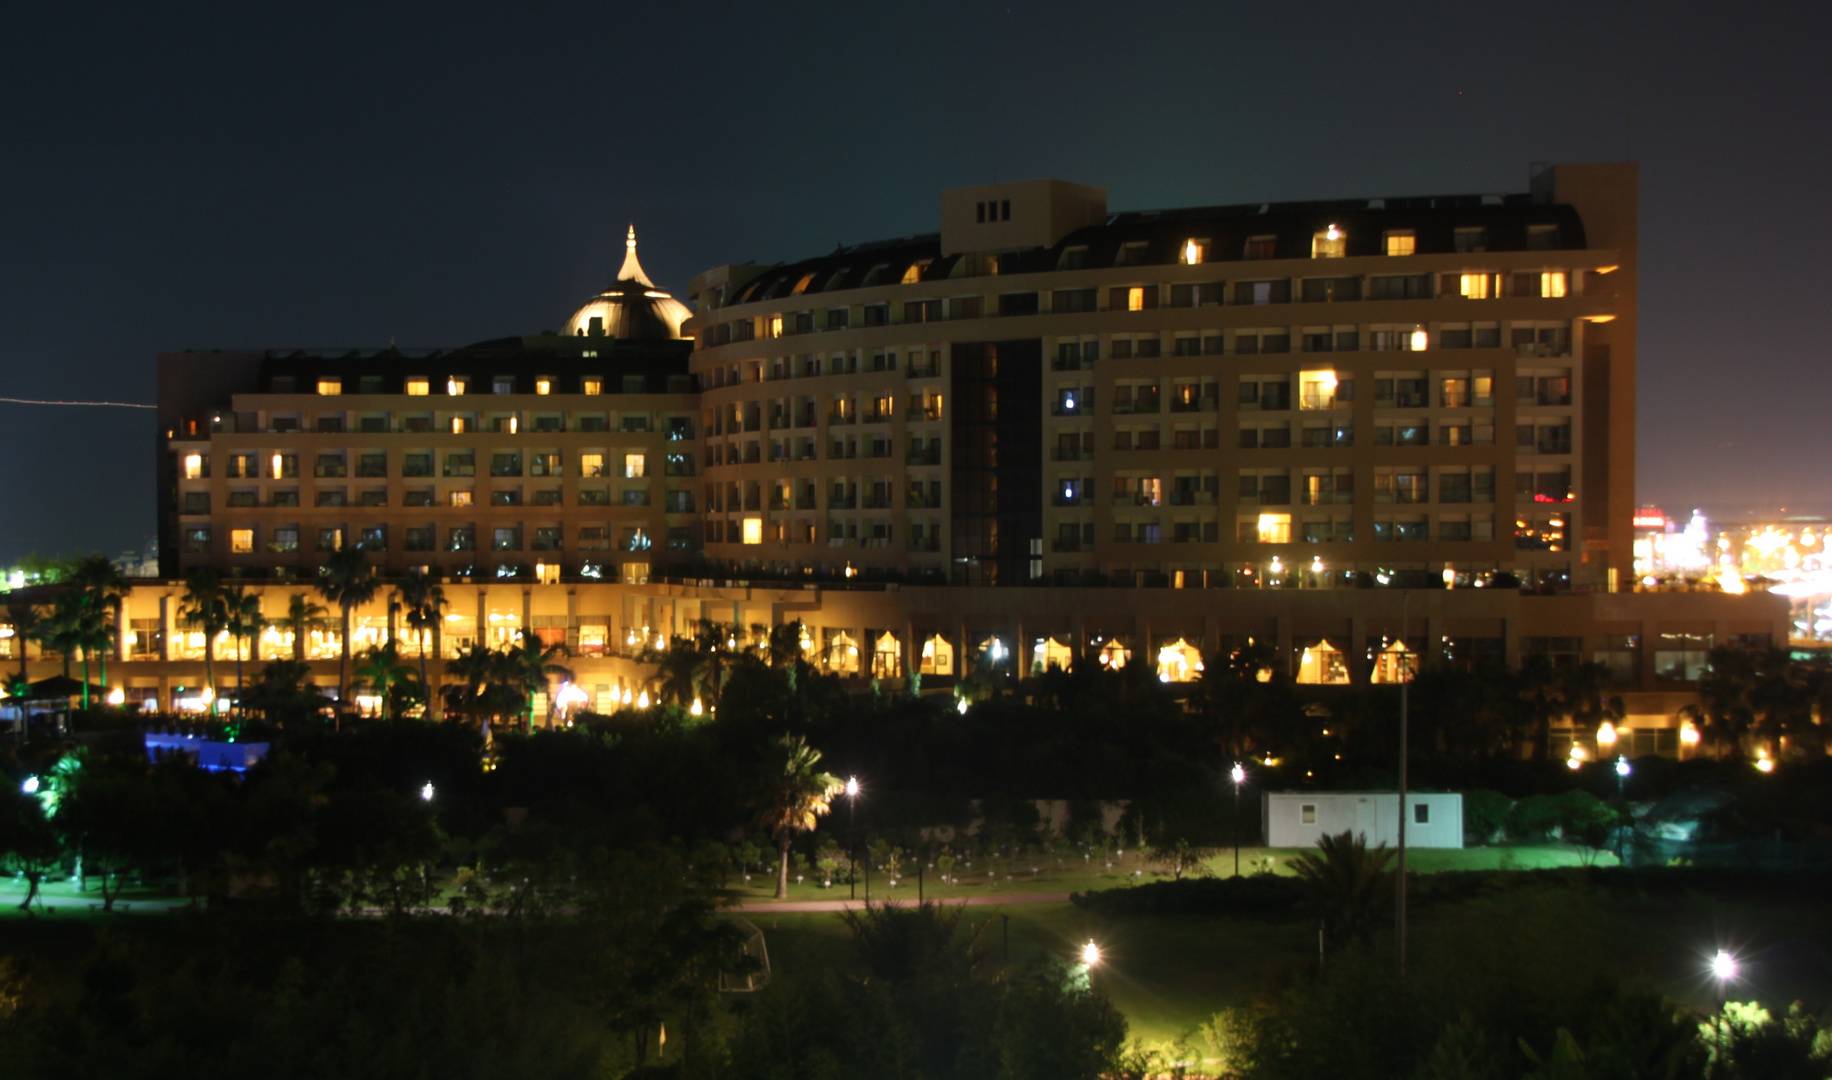 Hotel bei Nacht,Türkei Lara 2012